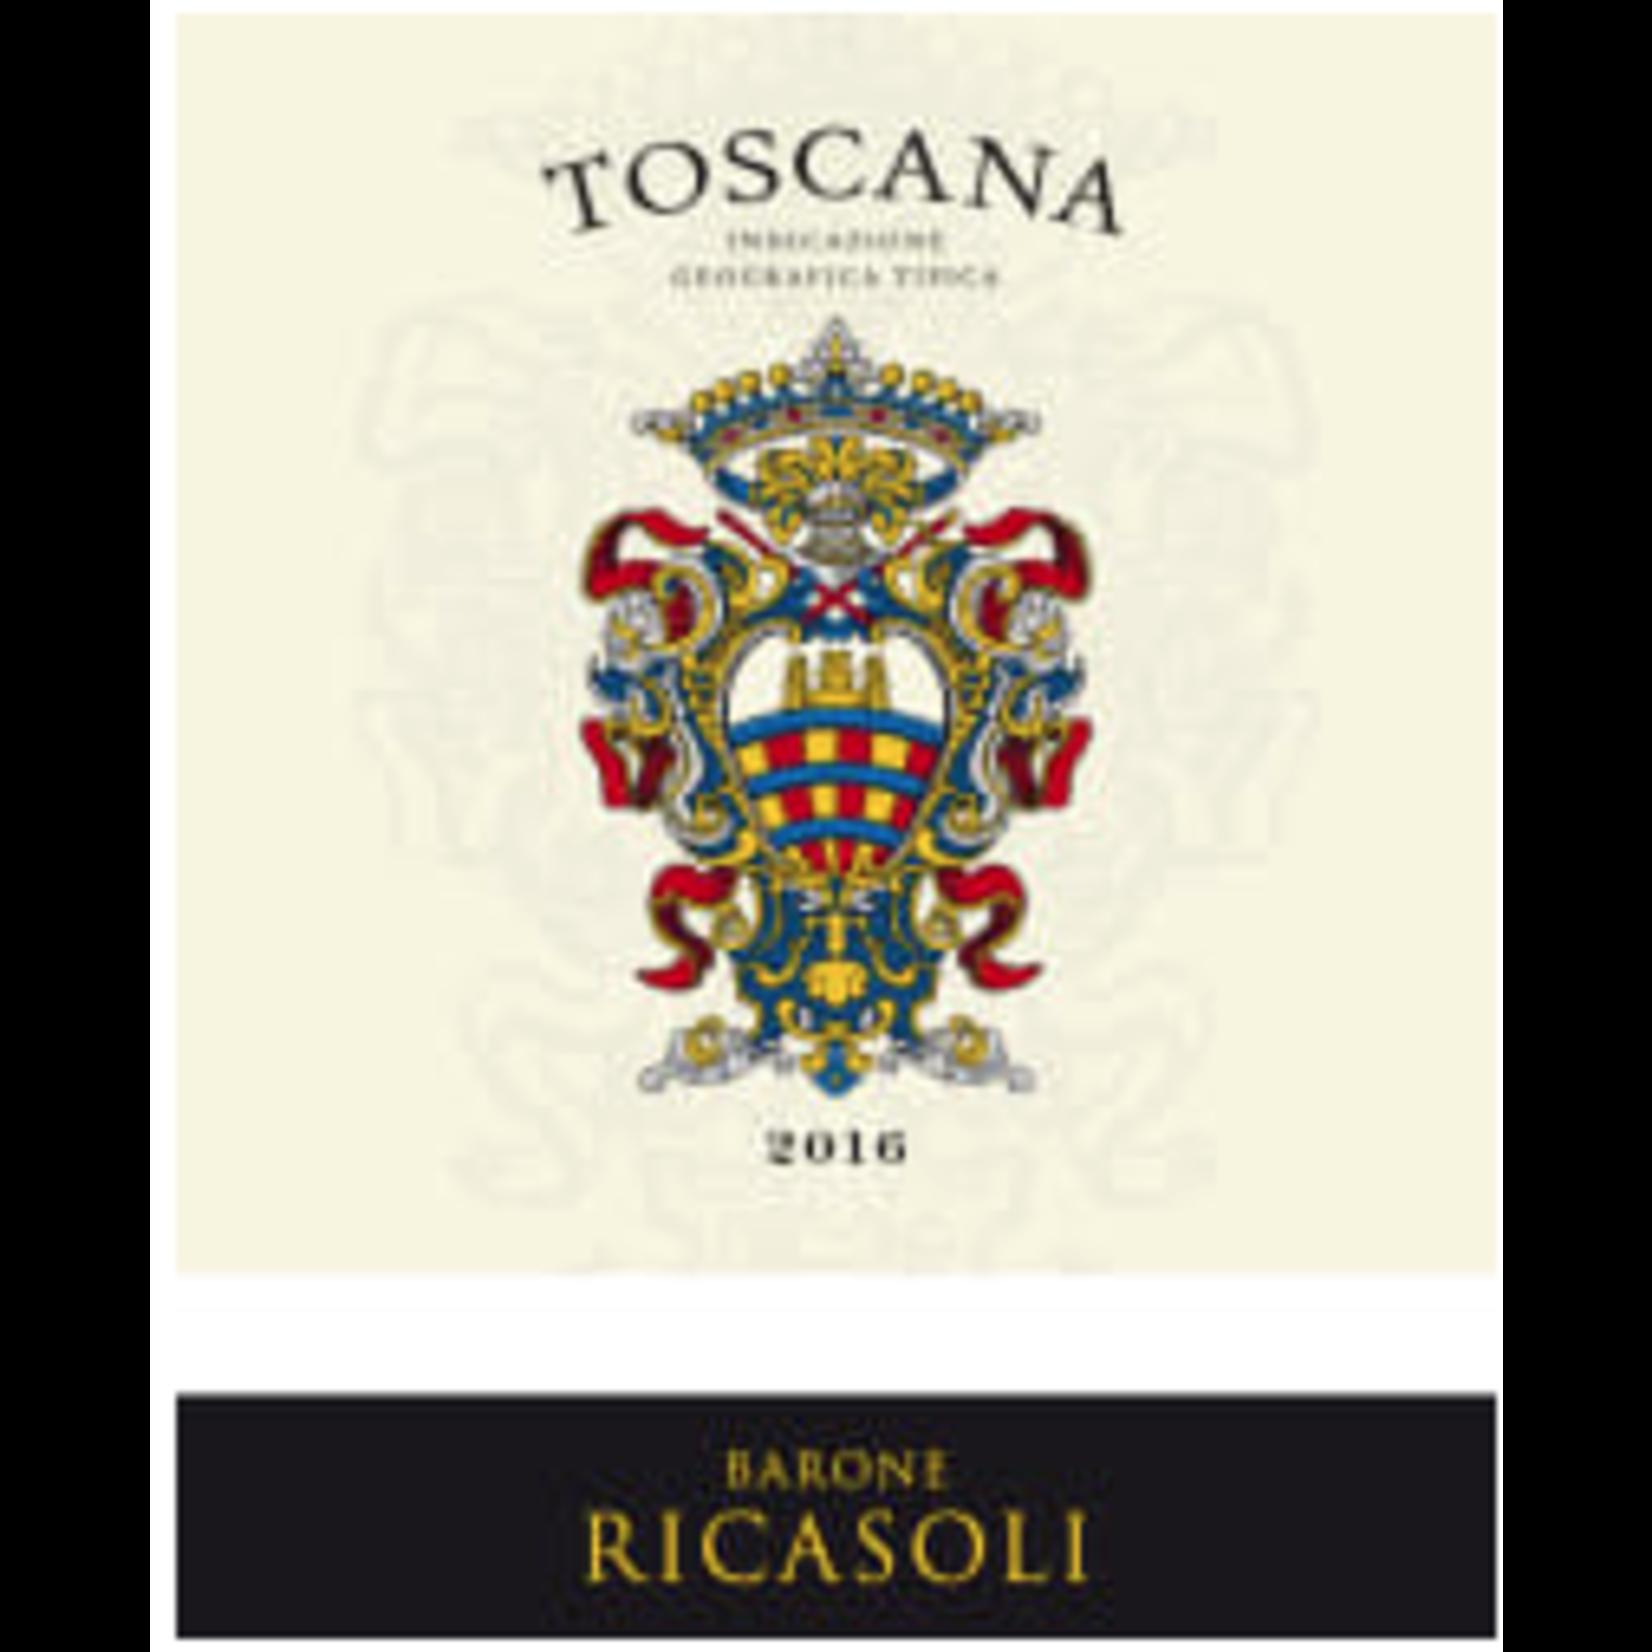 Barone Ricasoli Toscana Rosso 2016